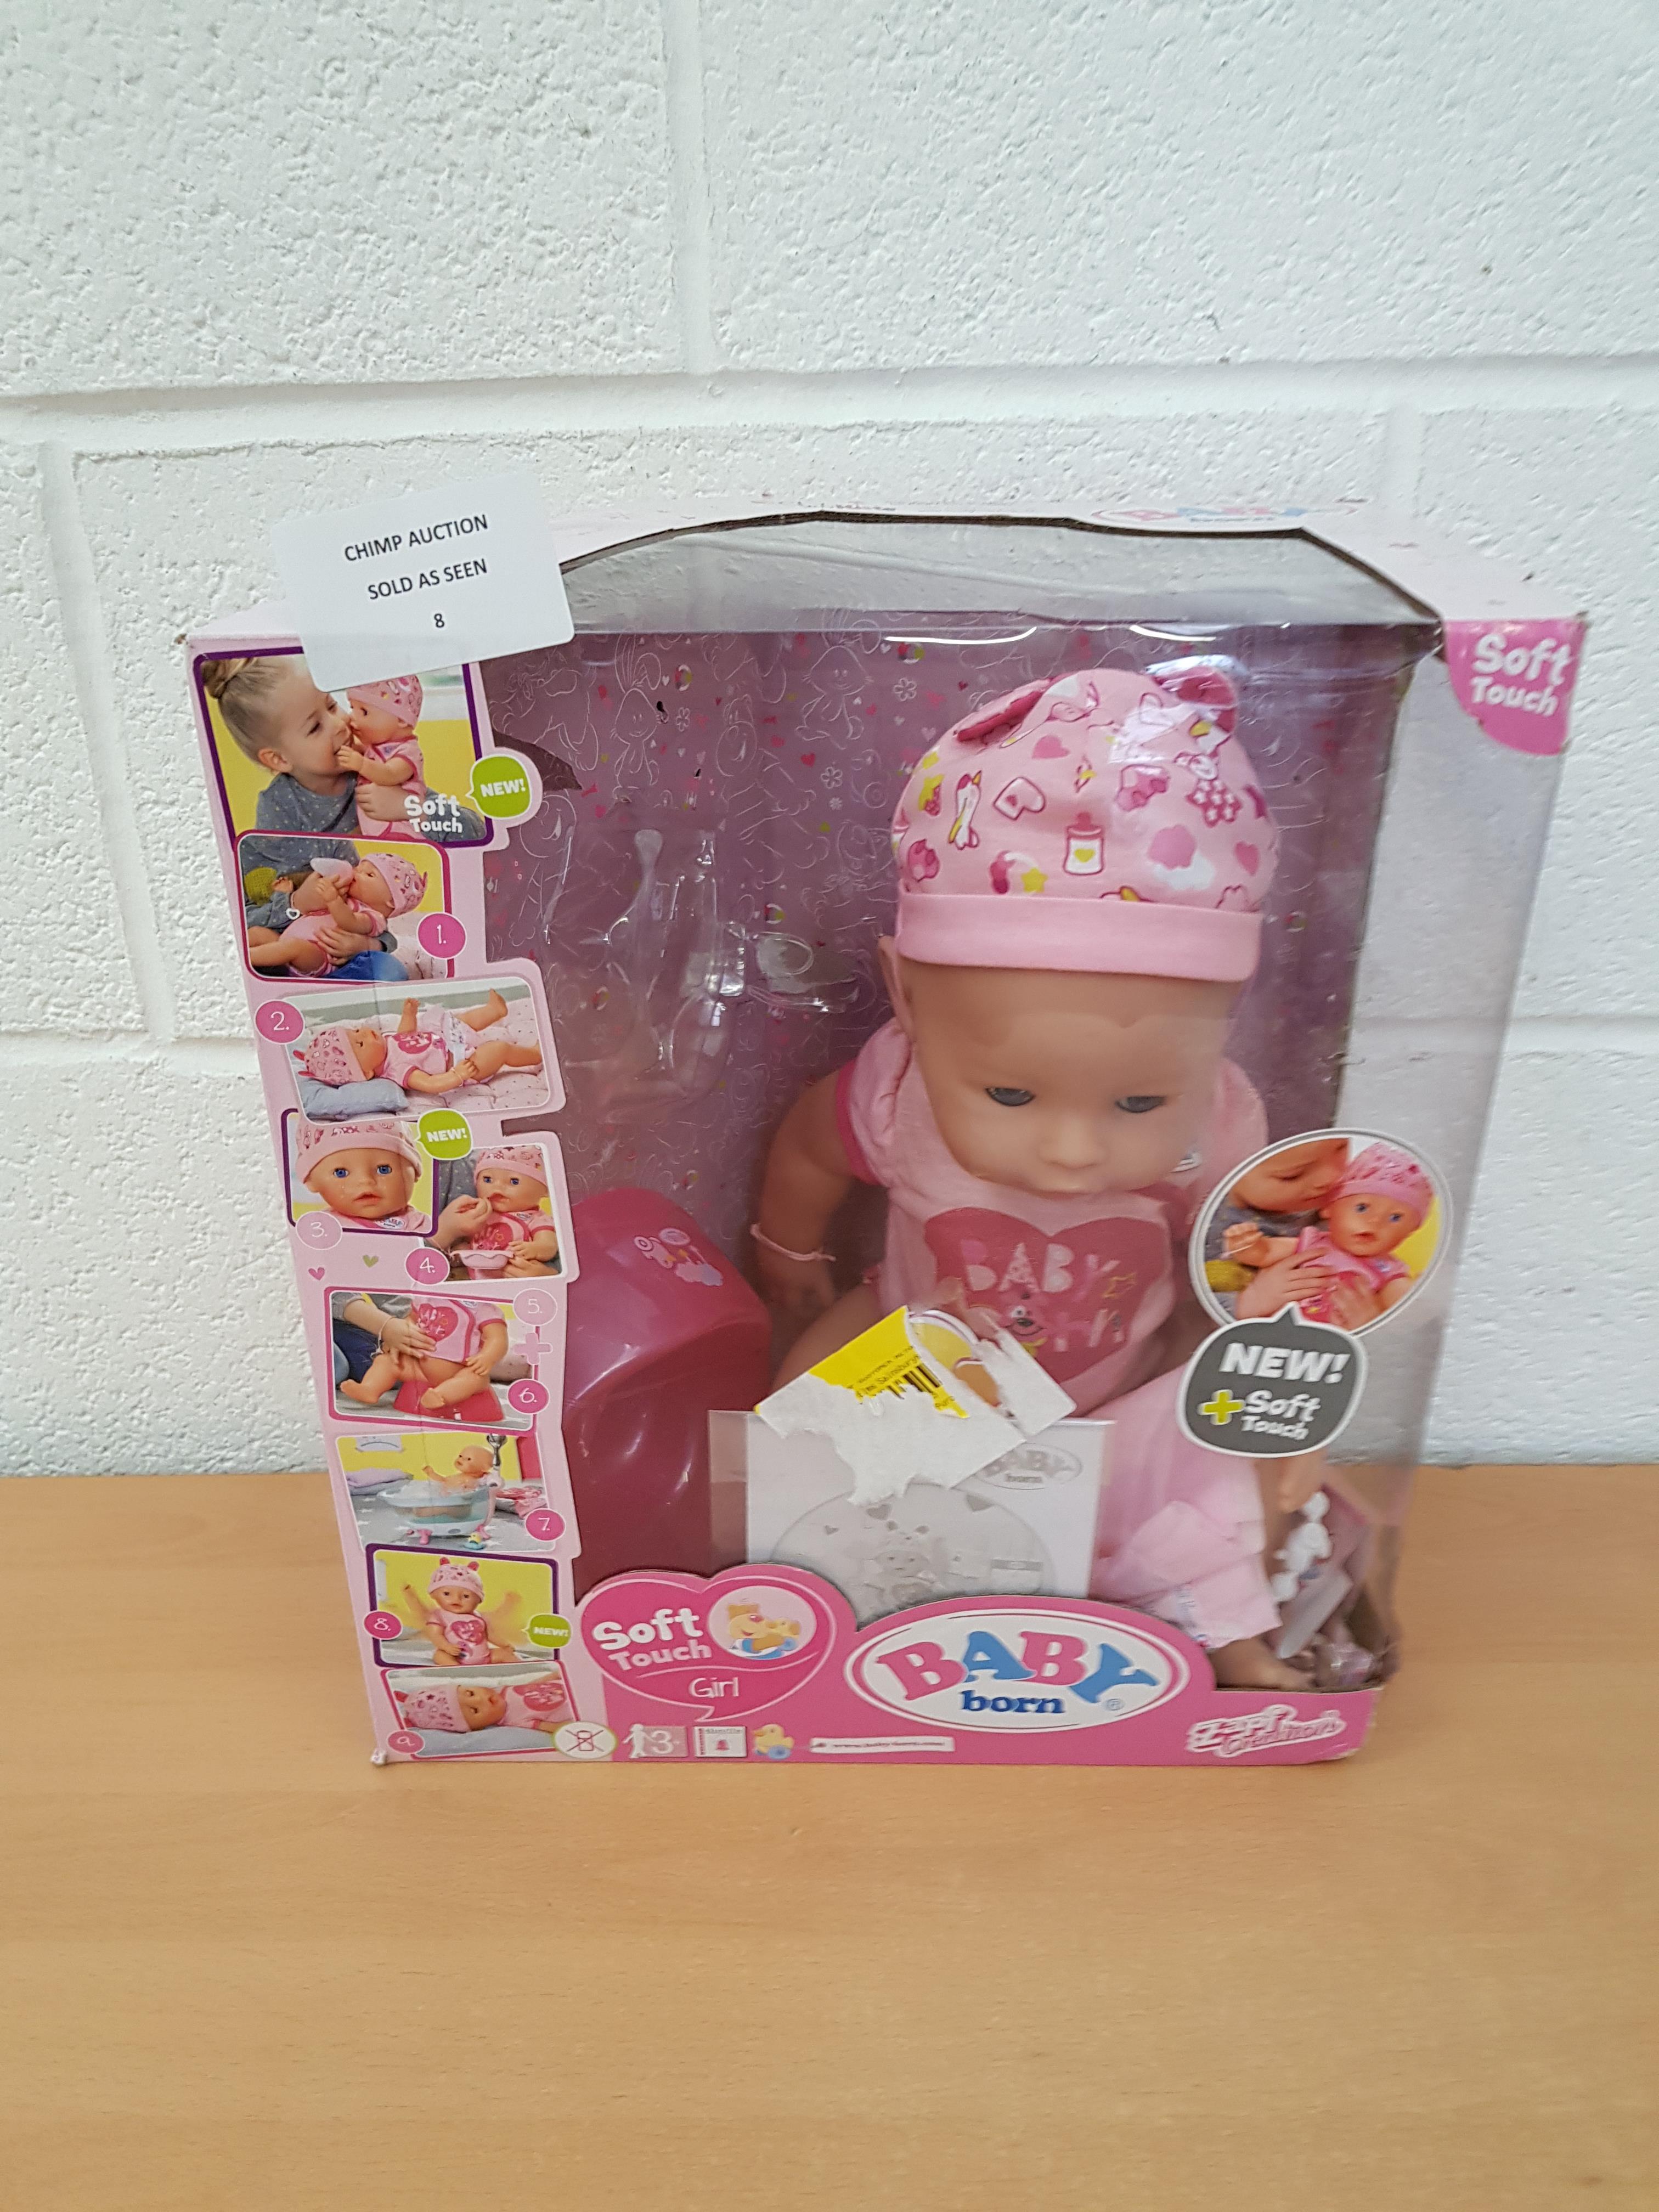 Lot 8 - Baby Born Doll interactive playset